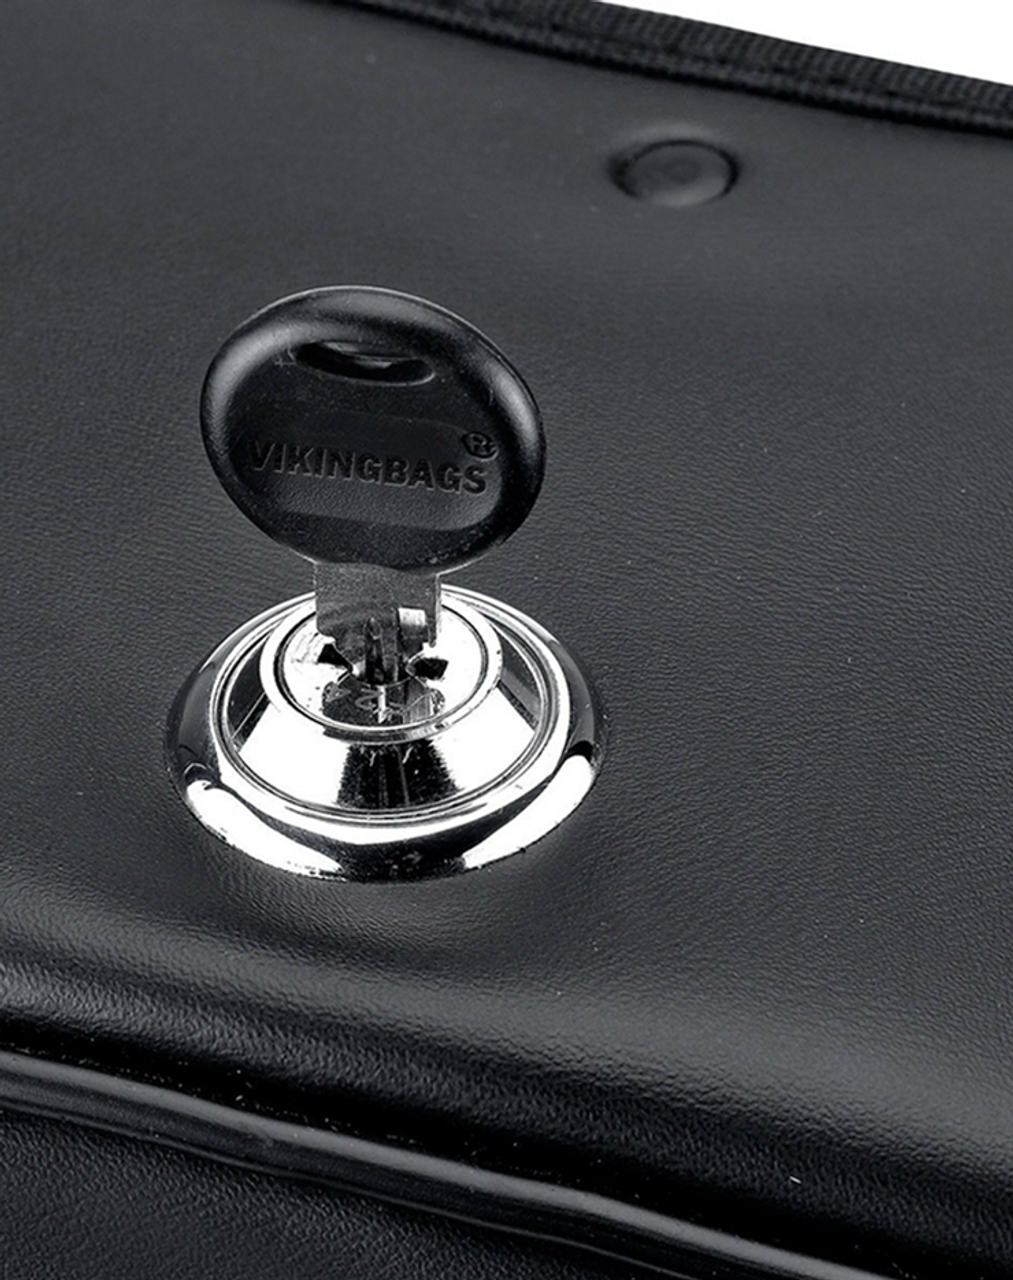 Suzuki Intruder 1500 VL1500 Charger Single Strap Studded Motorcycle Saddlebags Key Lock View